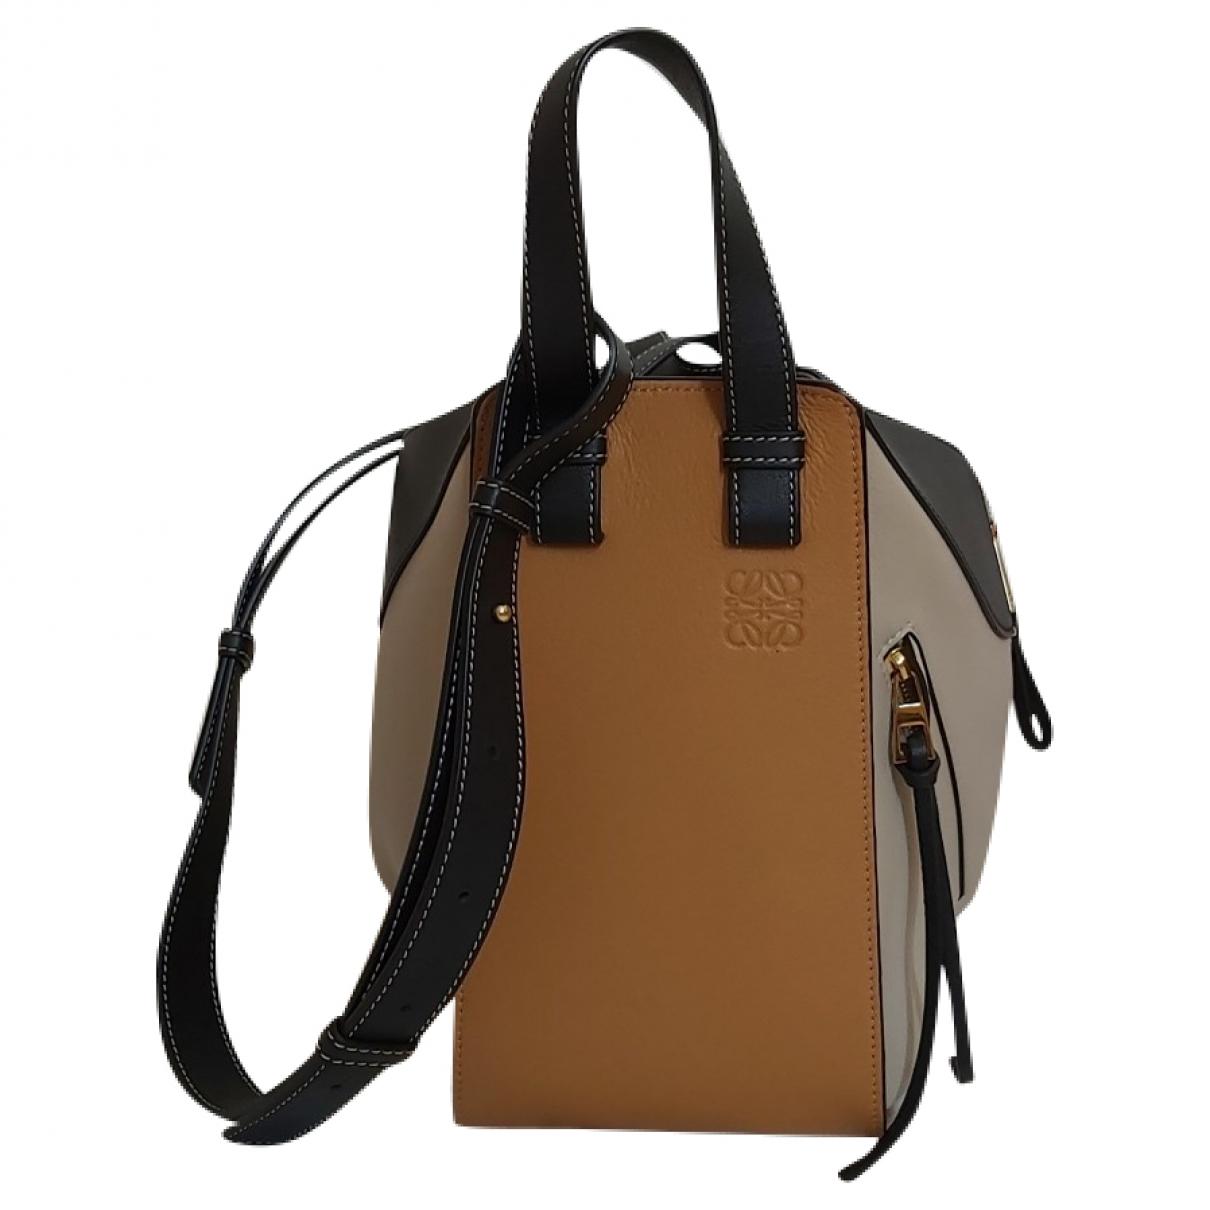 Loewe Hammock Multicolour Leather handbag for Women \N